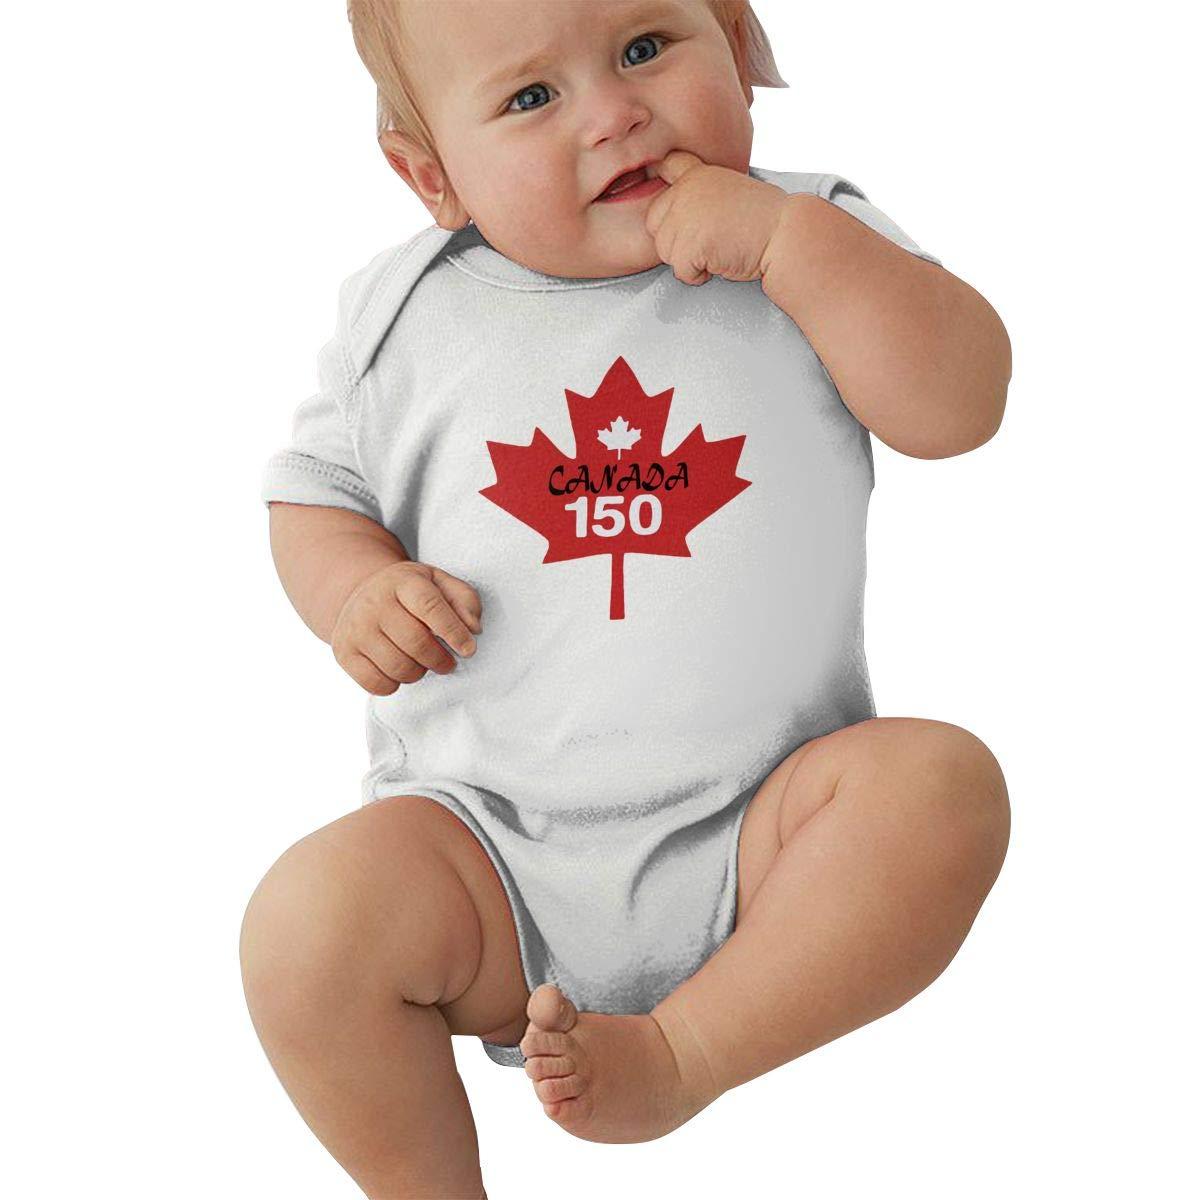 LBJQ9 Canada Popular 150th Birthday Unisex Baby Essential Basic Short Sleeve Bodysuit Jumpsuit Outfits